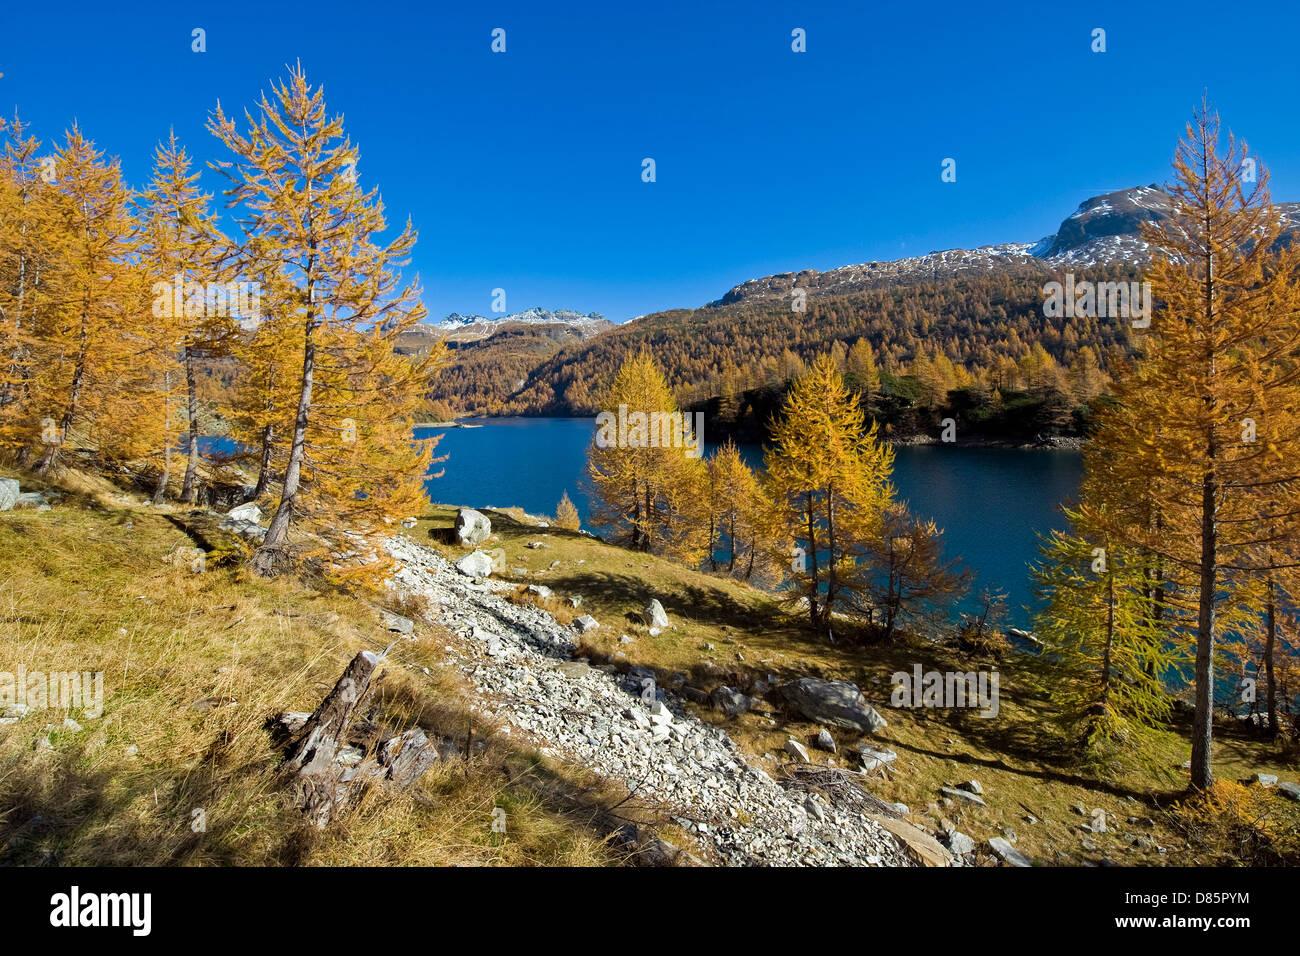 Italy Piedmont Devero alp Alpe Devero Devero lake - Stock Image